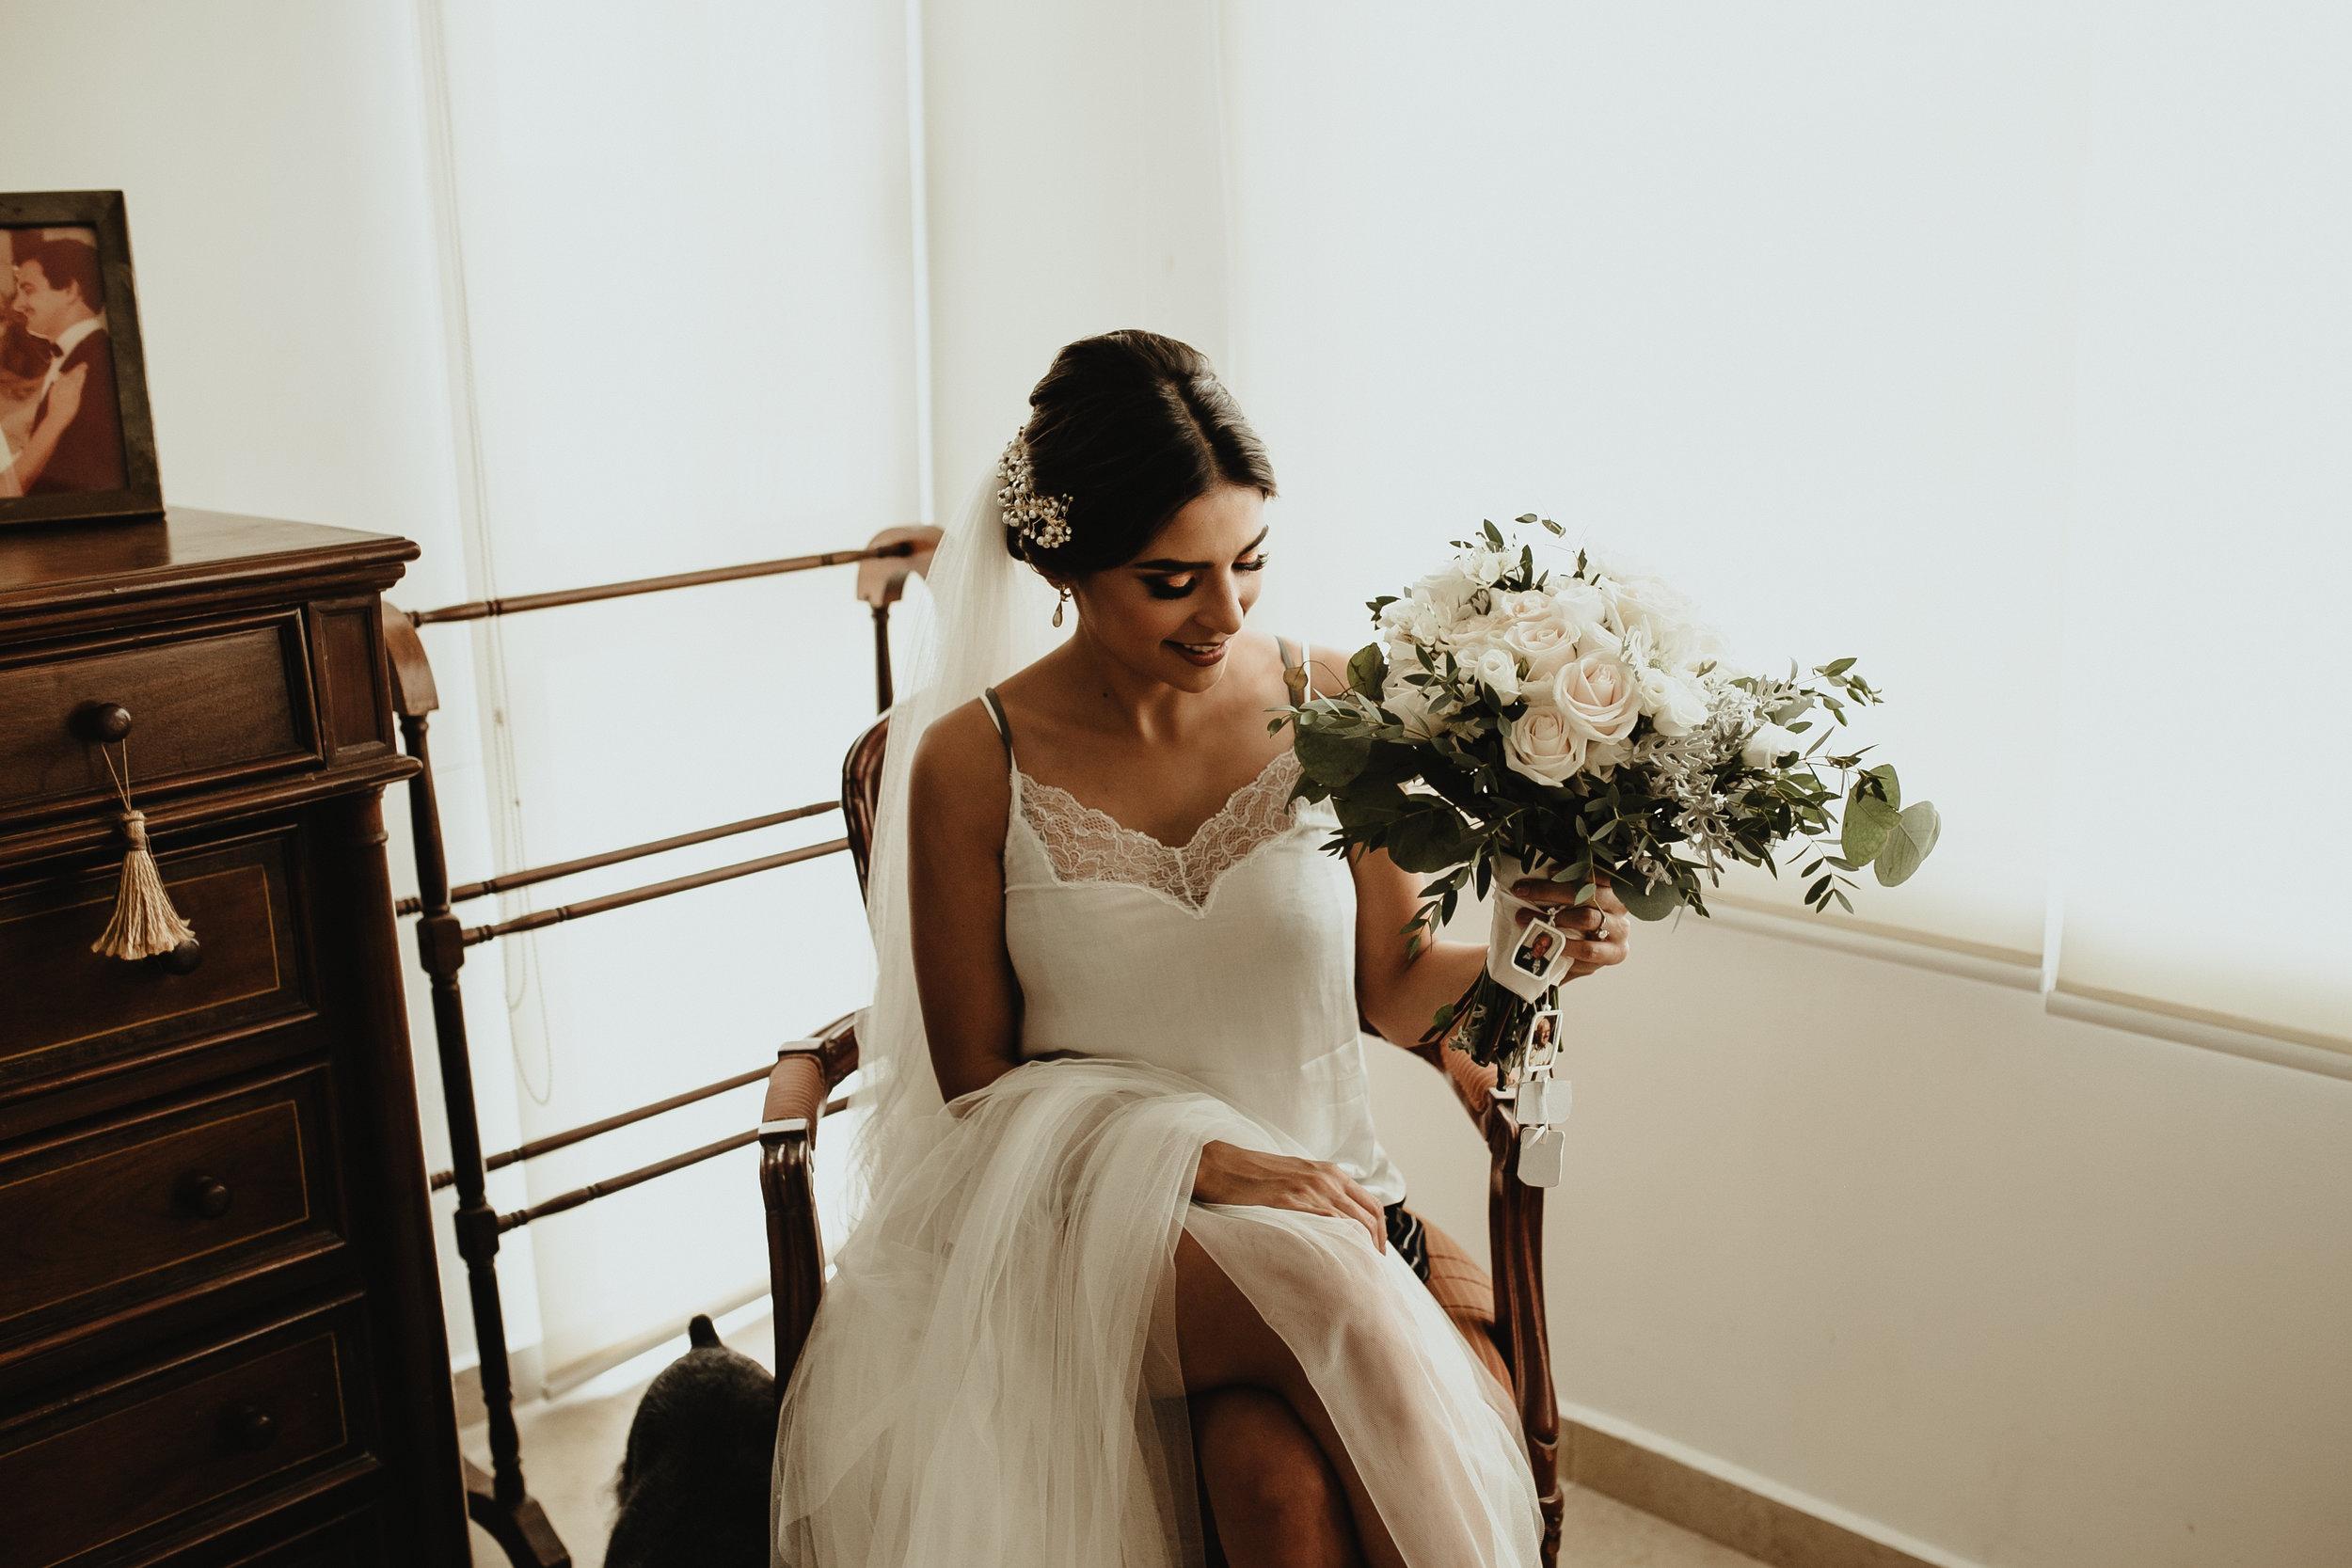 0076F&Yslide_WeddingDstination_MeridaYucatan_HaciendasMerida_BodasMexico_BodasYucatan_Boda_Destino.jpg